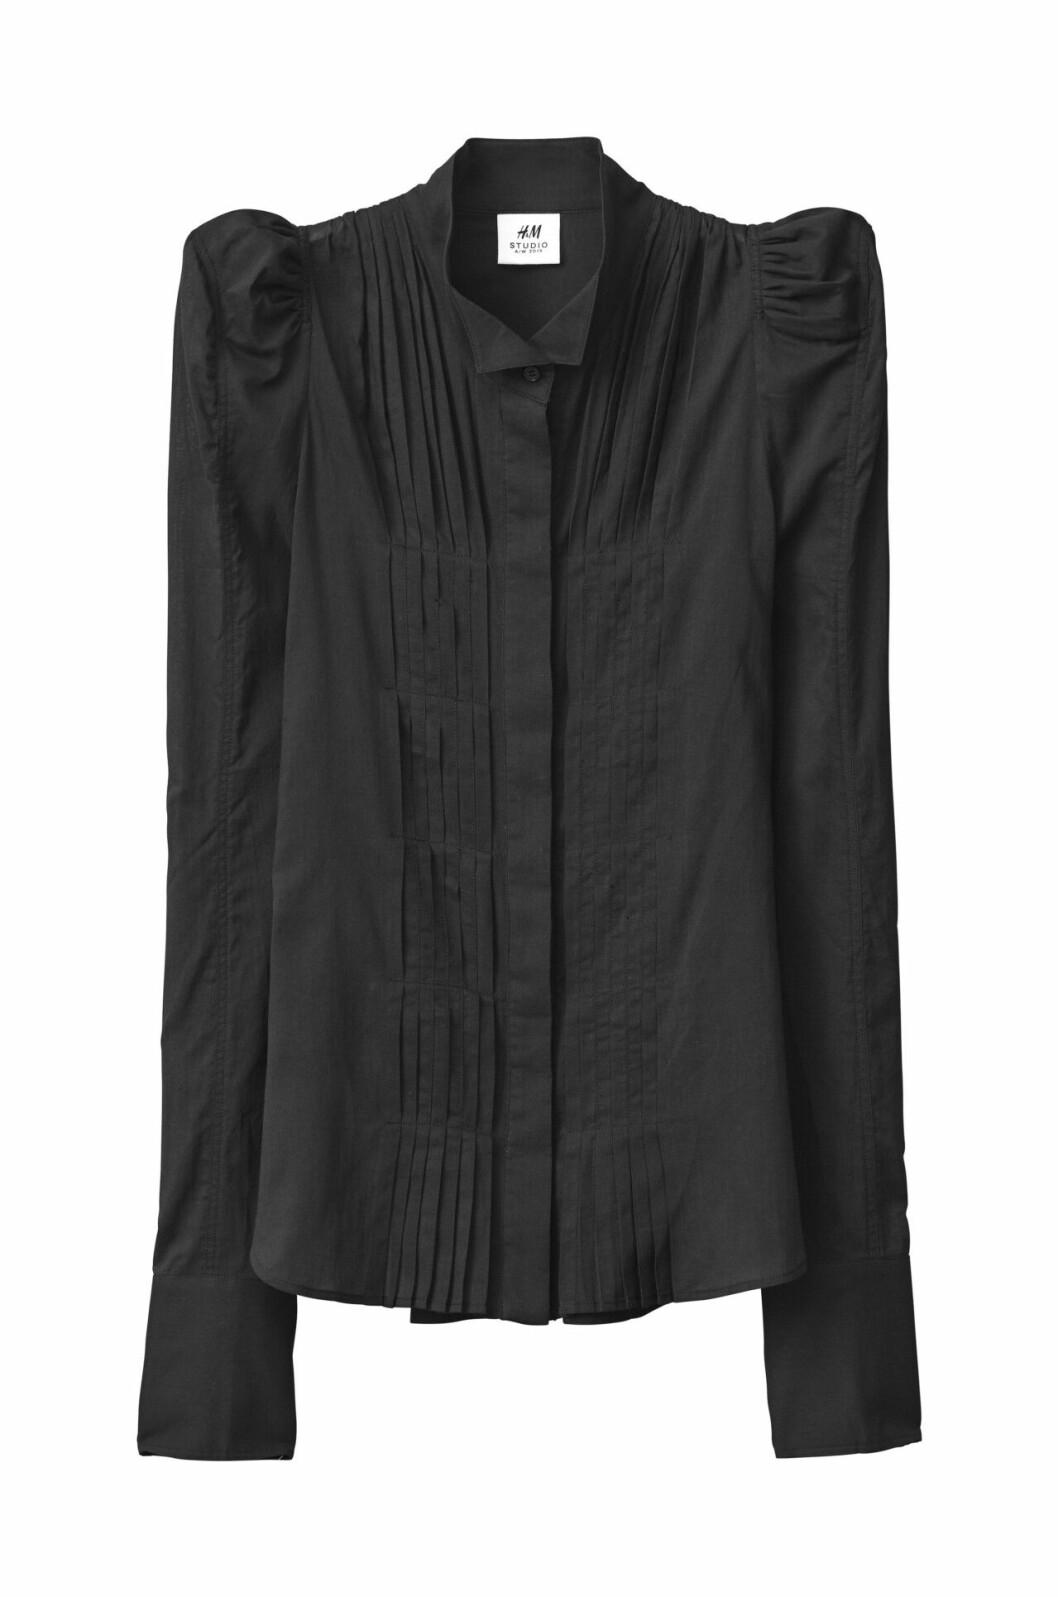 H&M Studio höstkollektion aw 2019 – svart blus